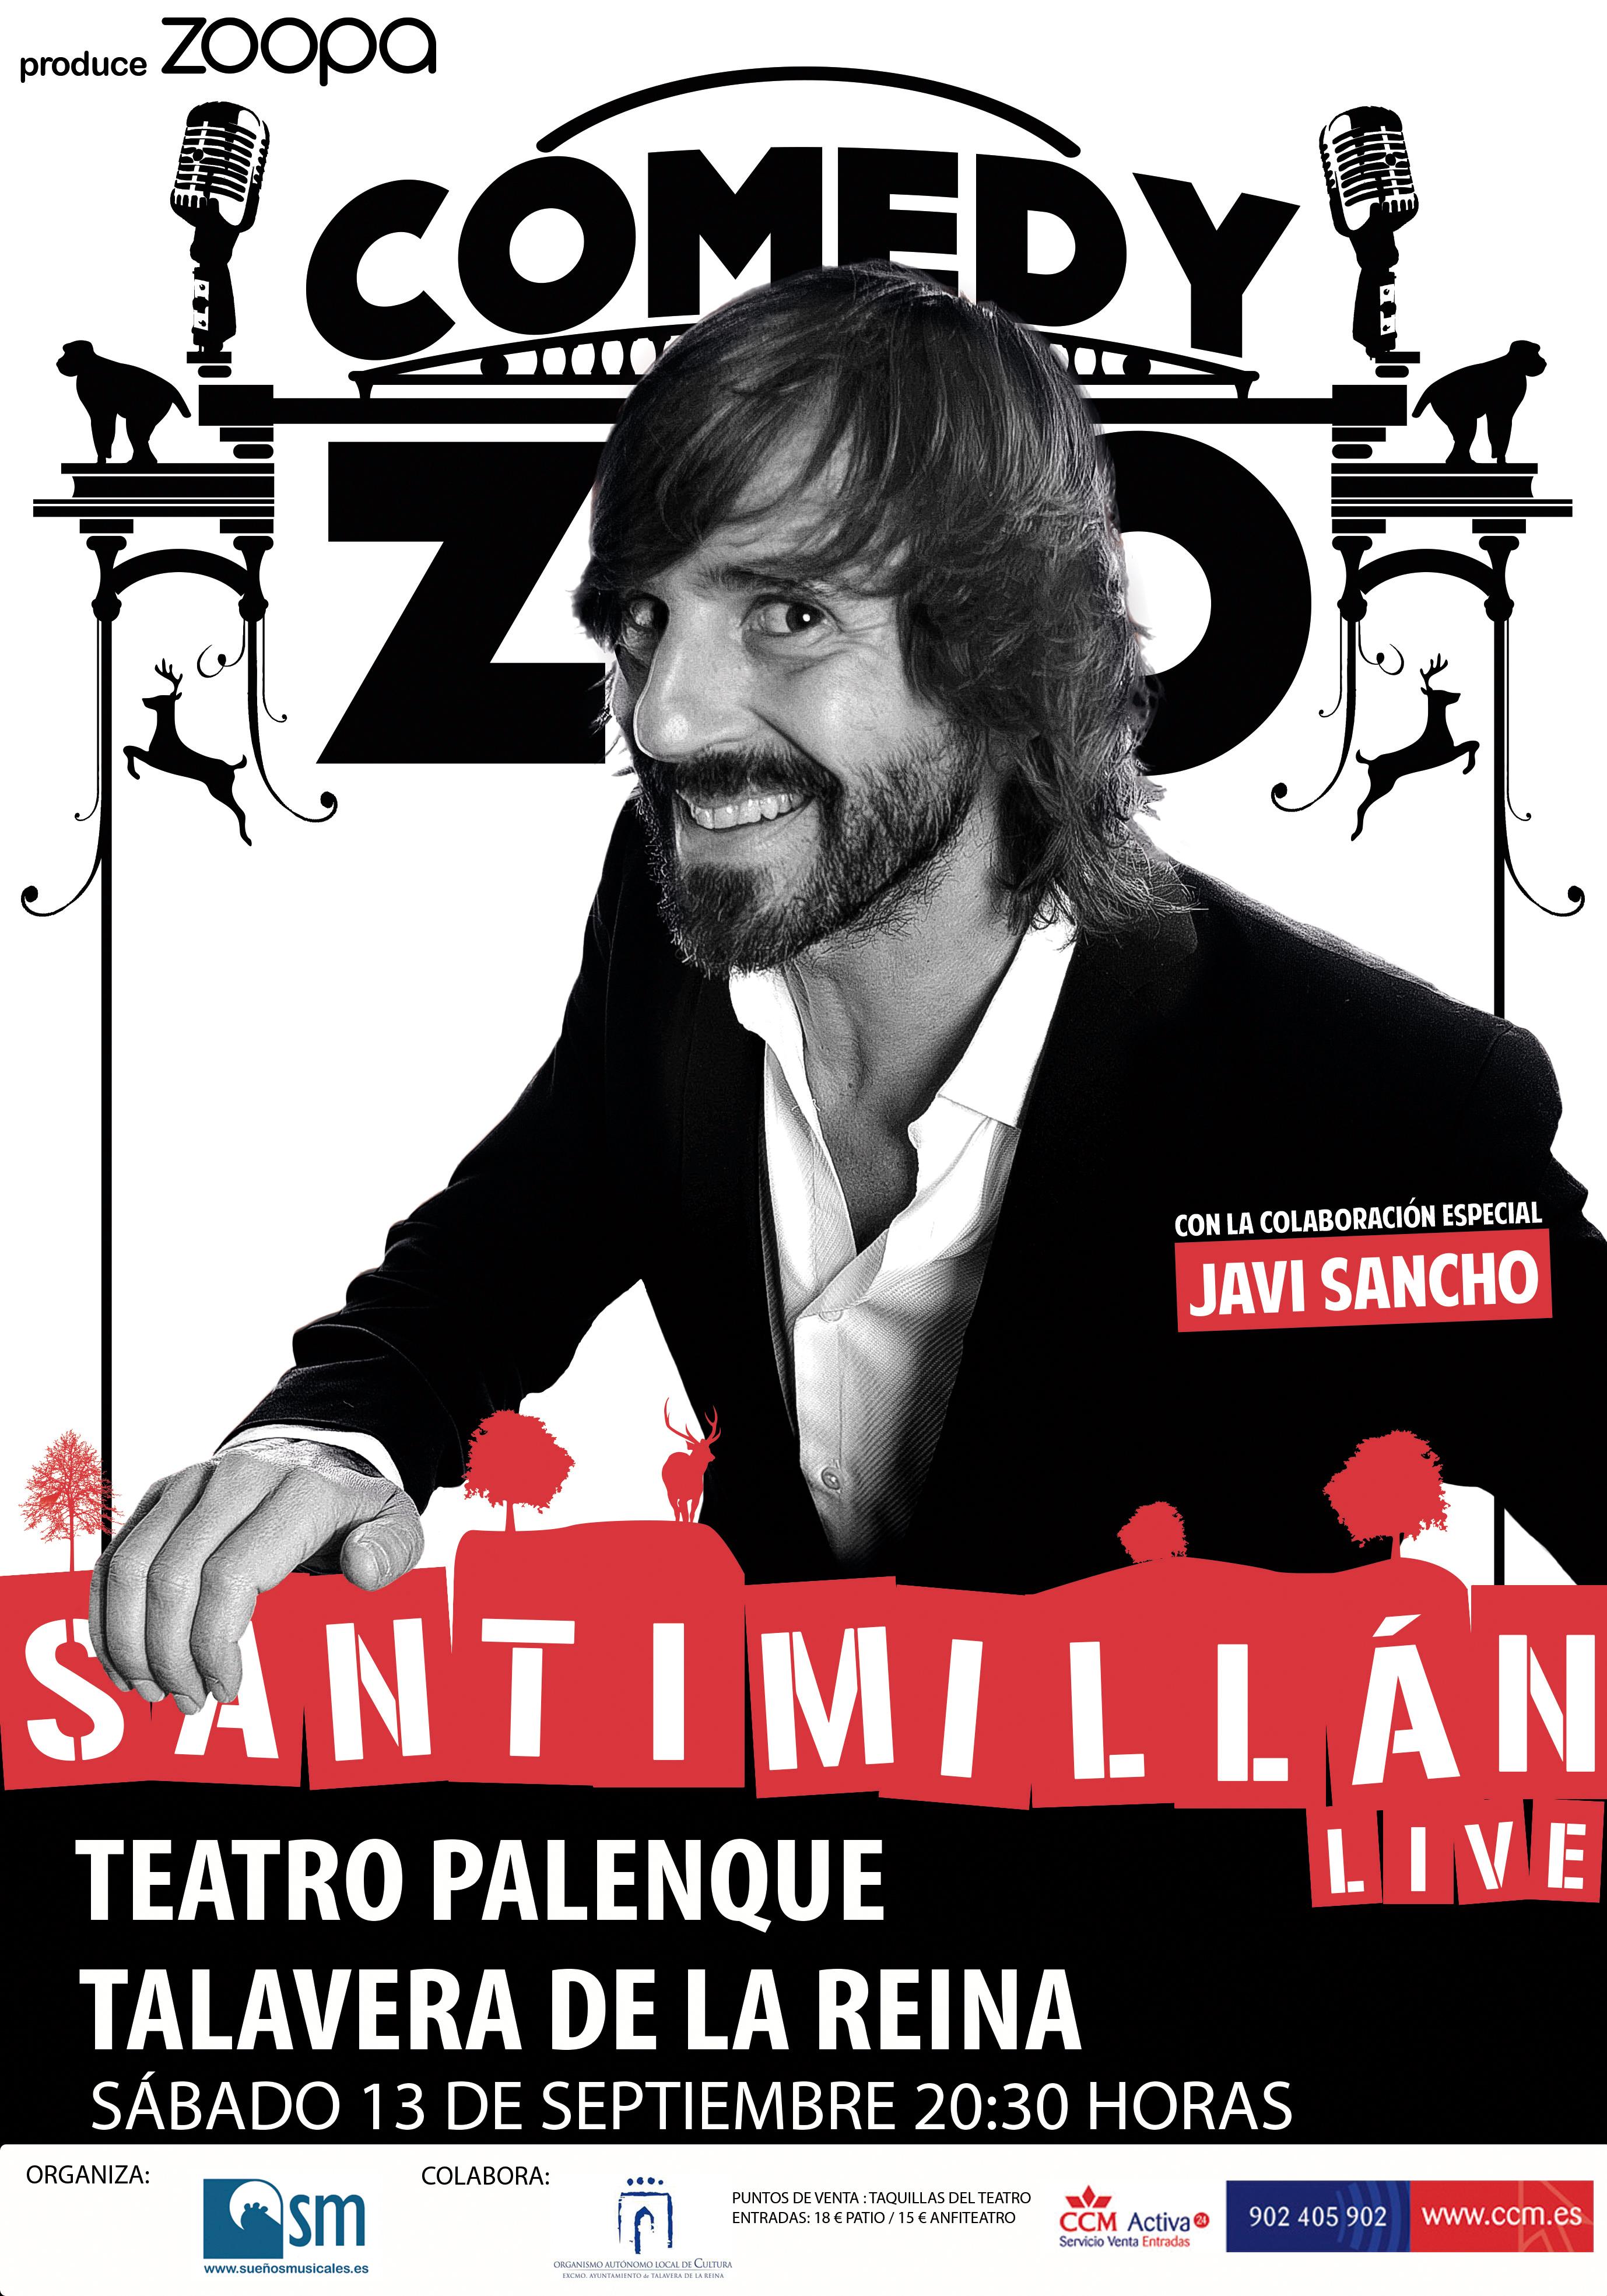 Santi Millán Live – Talavera de la Reina